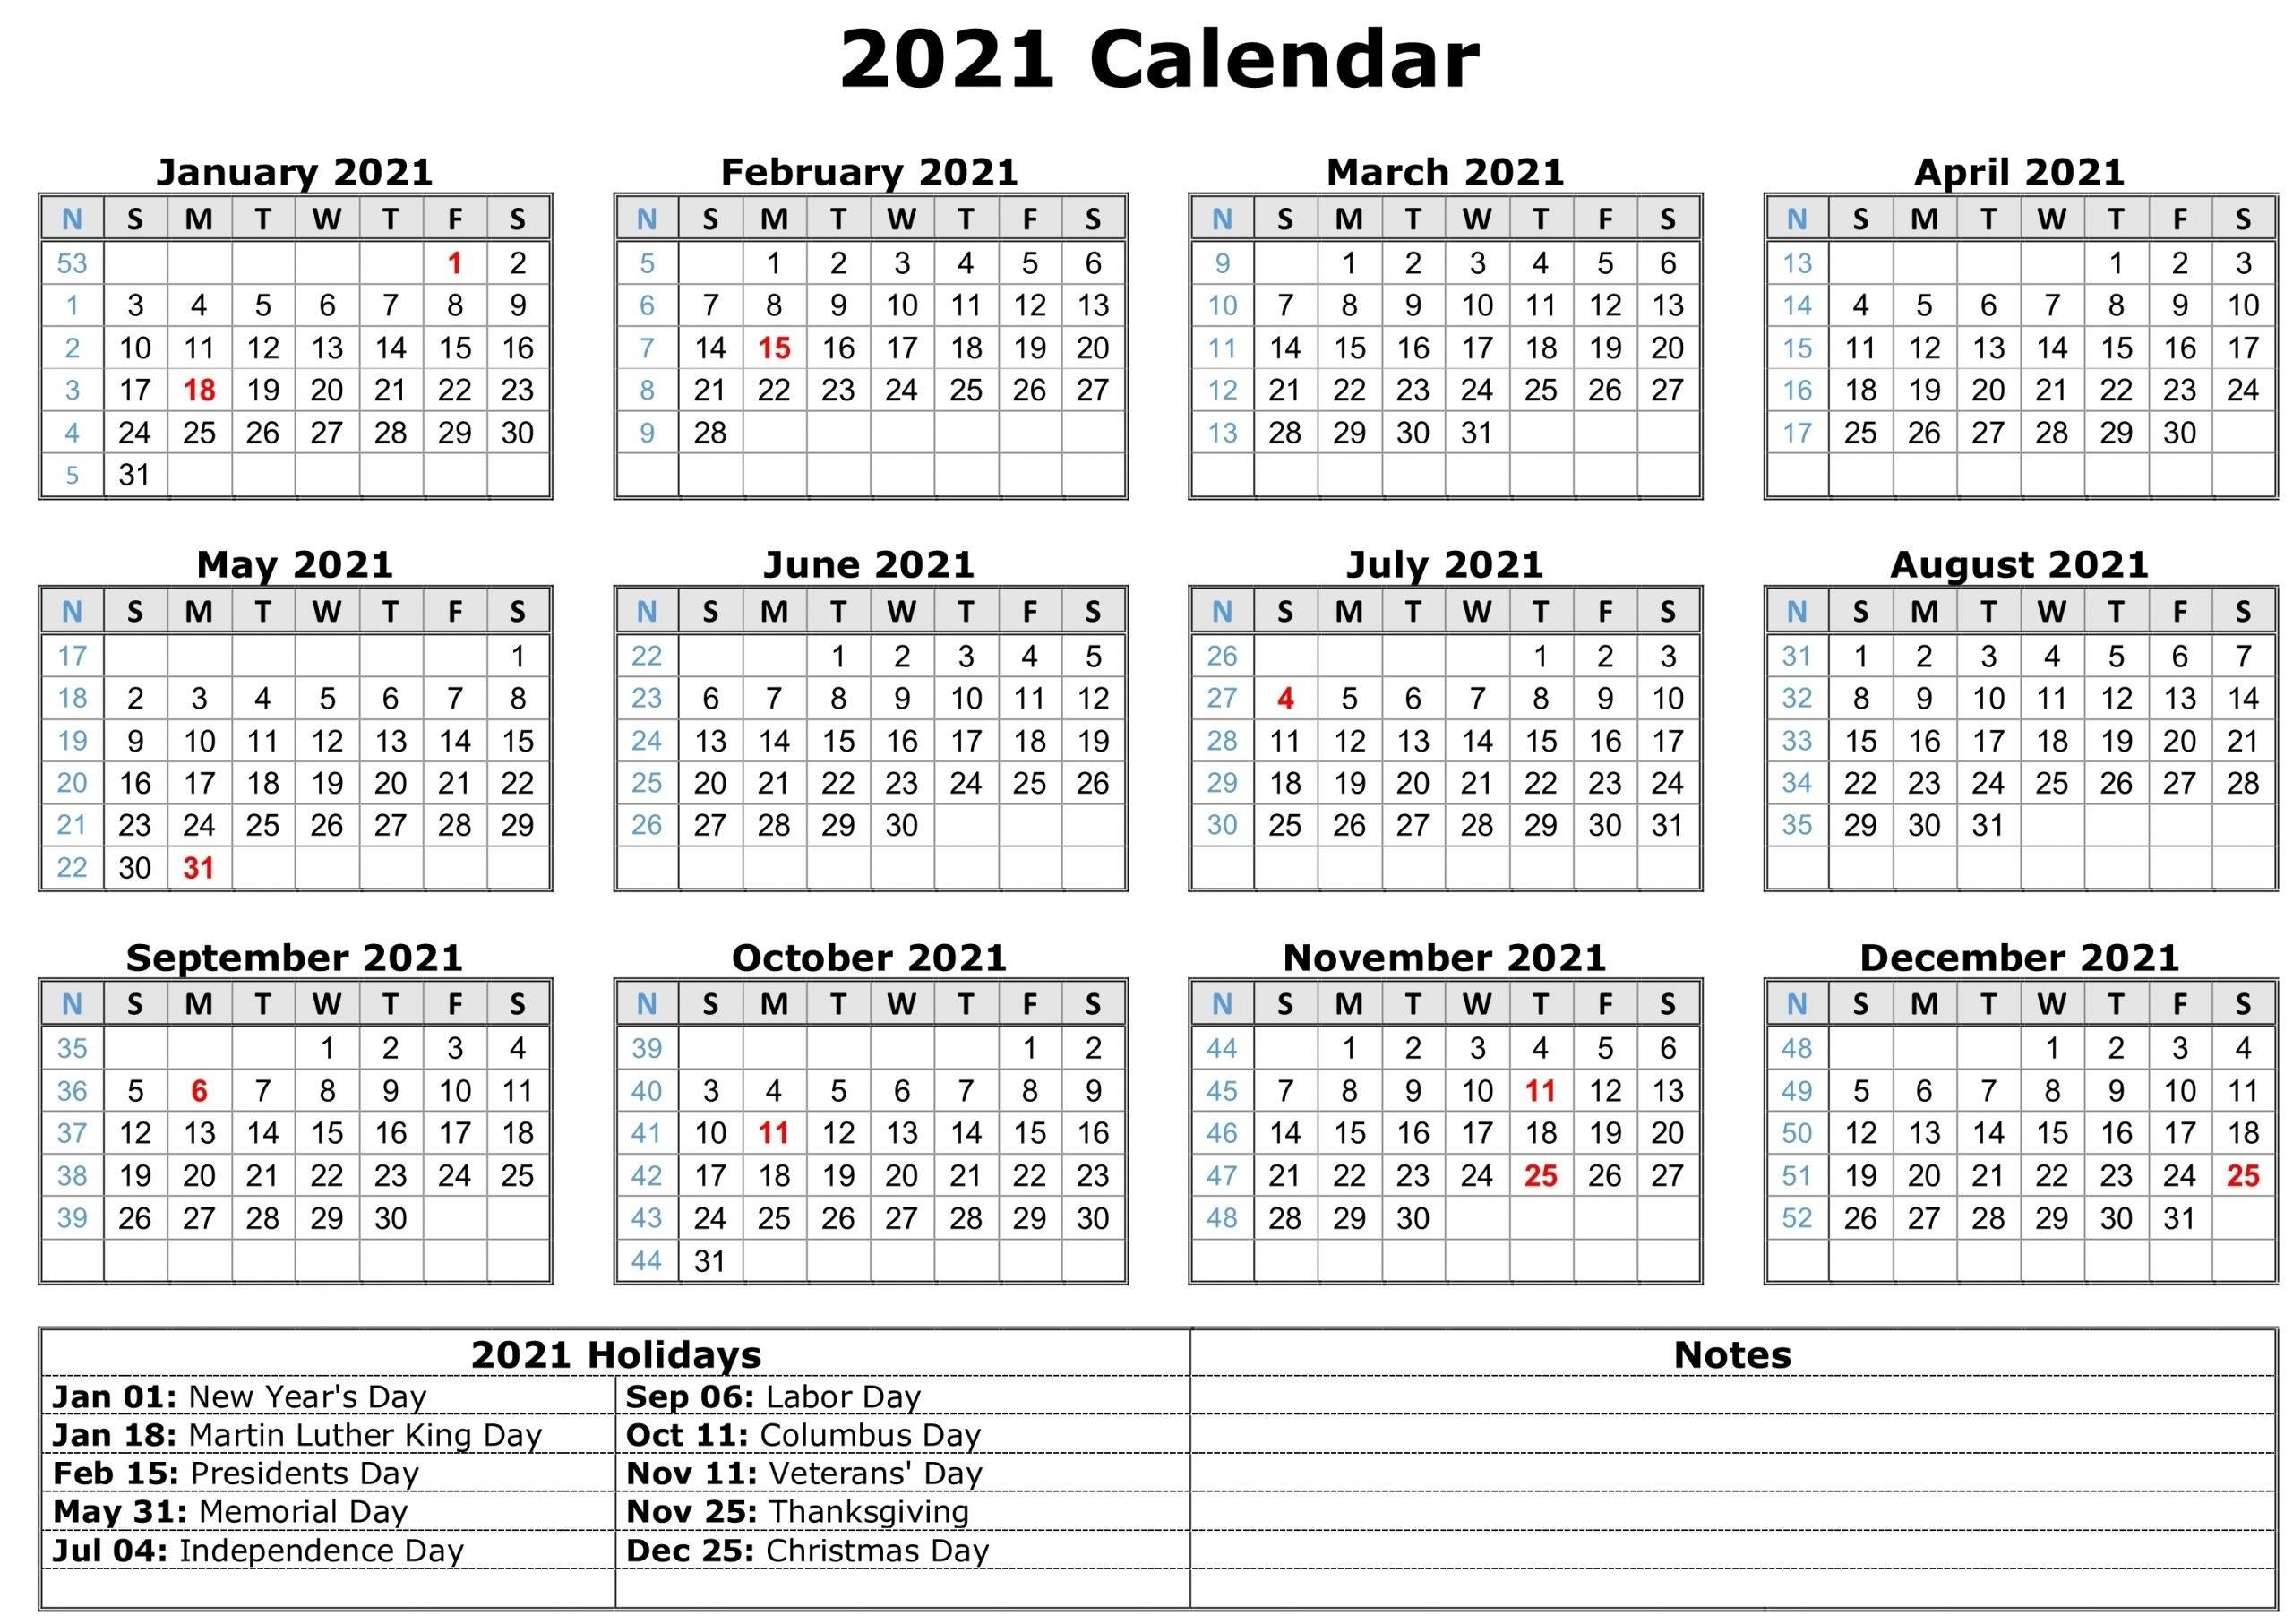 Free Printable 2021 Monthly Calendar With Holidays Malaysia   Printable Calendar throughout 2021 Printable Monthly Calendar